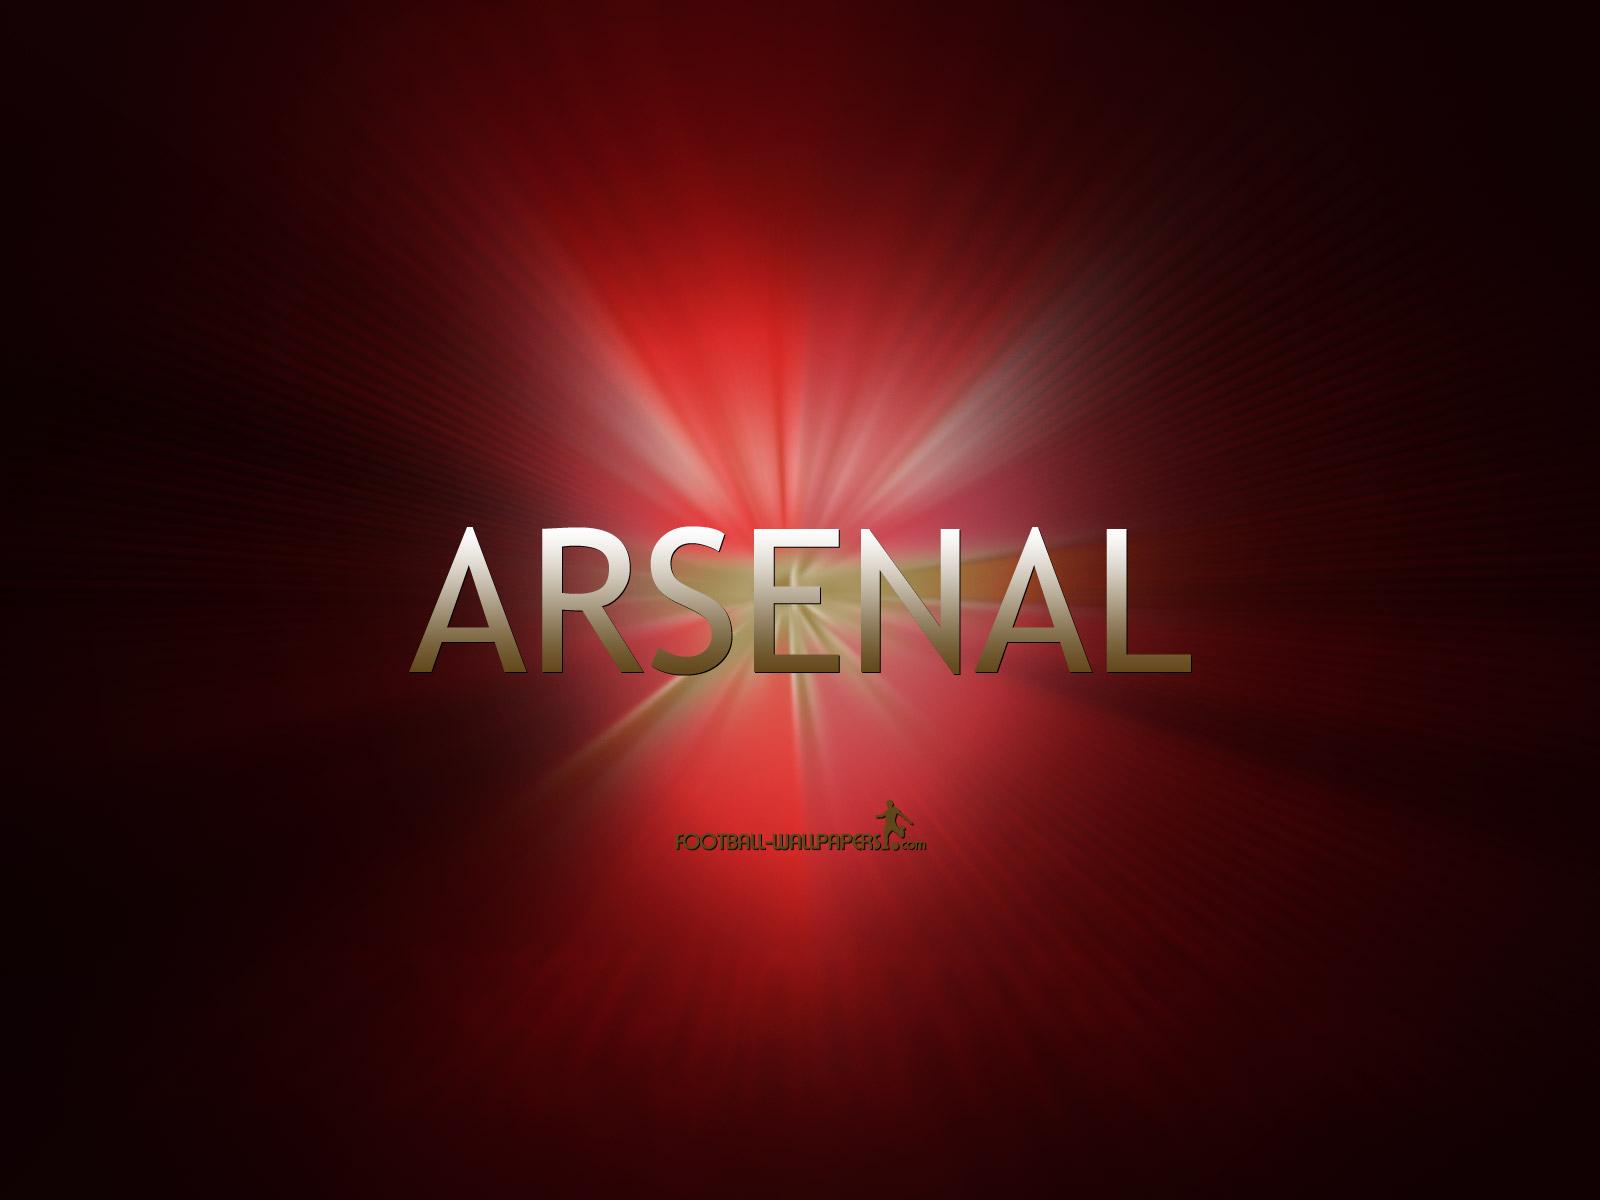 Arsenal Football Club Wallpapers HD HD Wallpapers 1600x1200